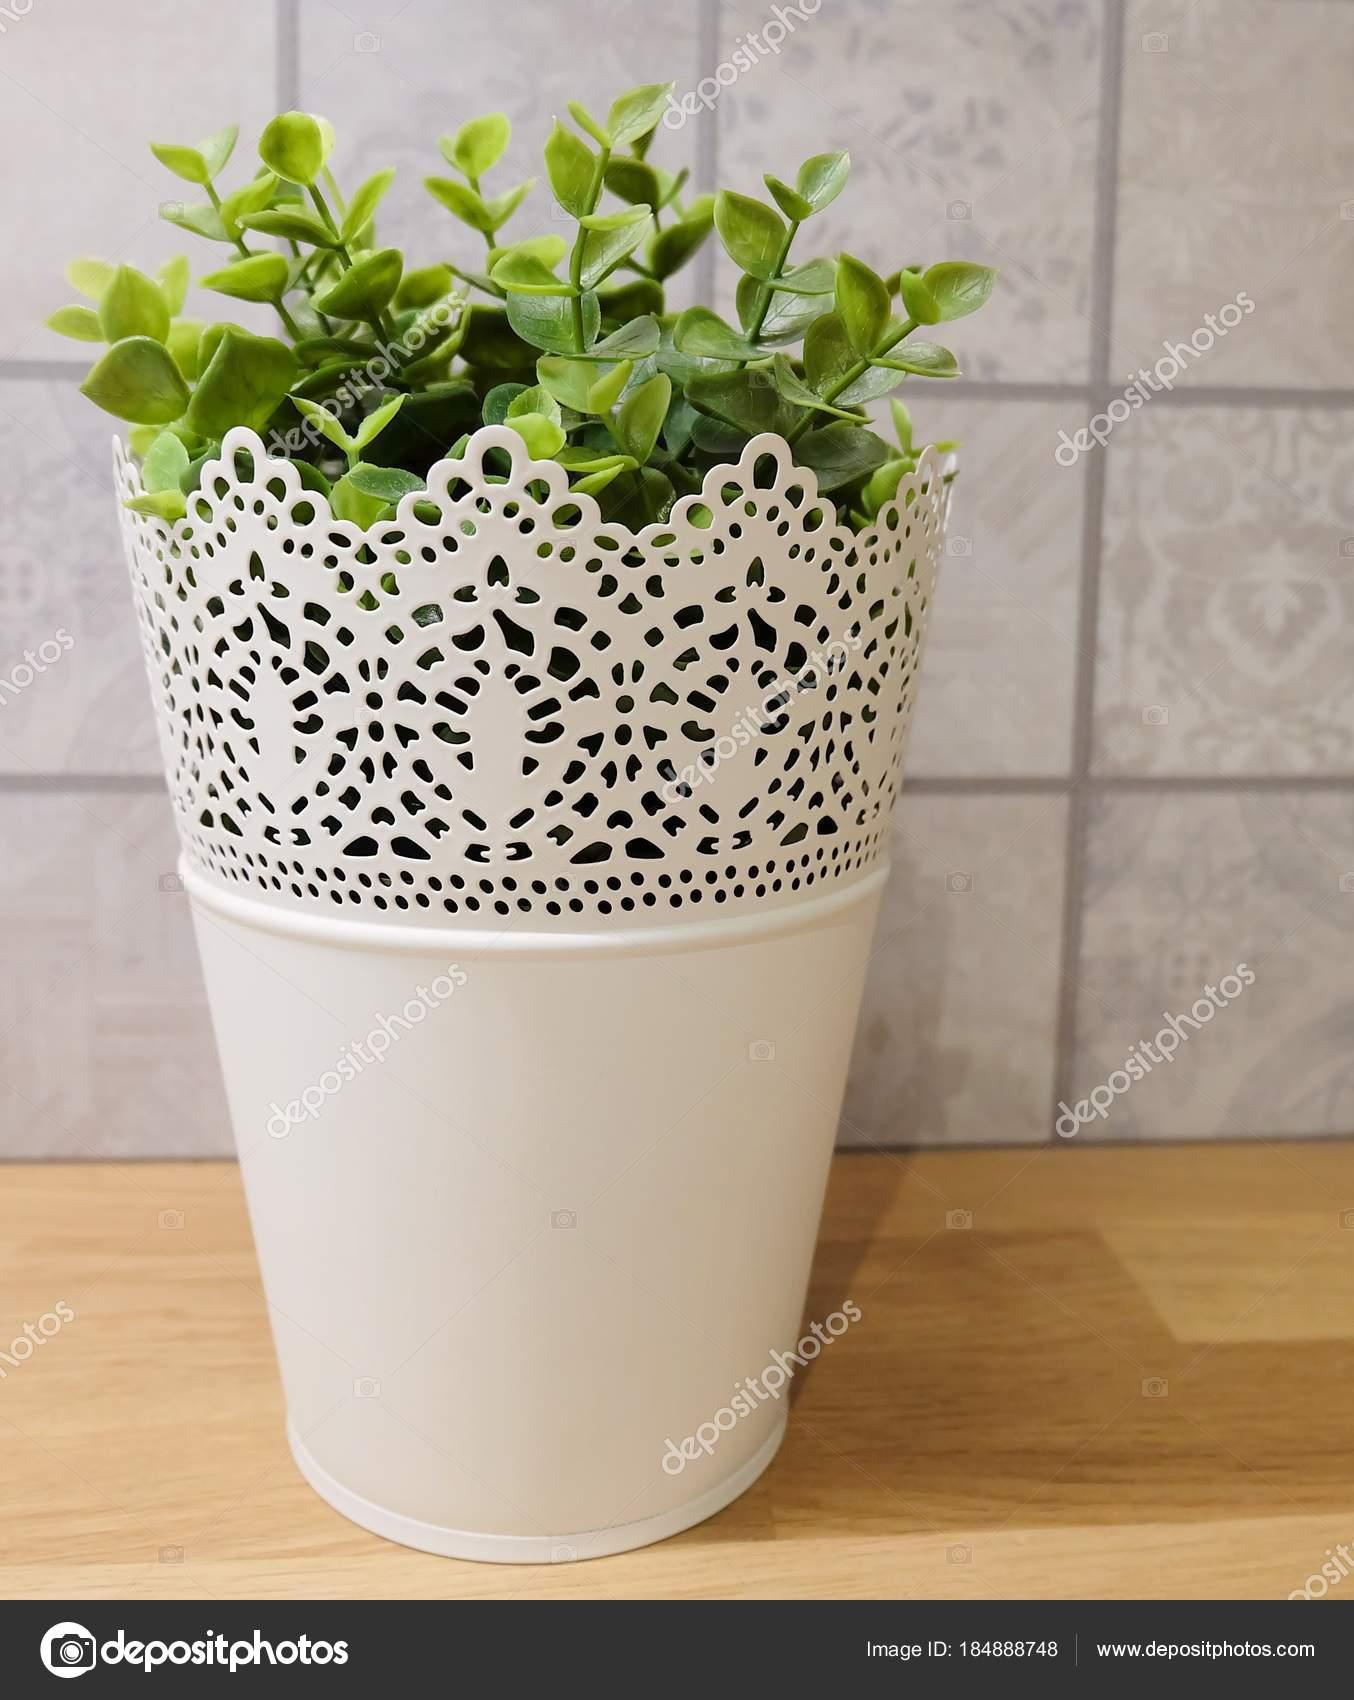 green artificial plants in a metal pot — stock photo © arayabandit